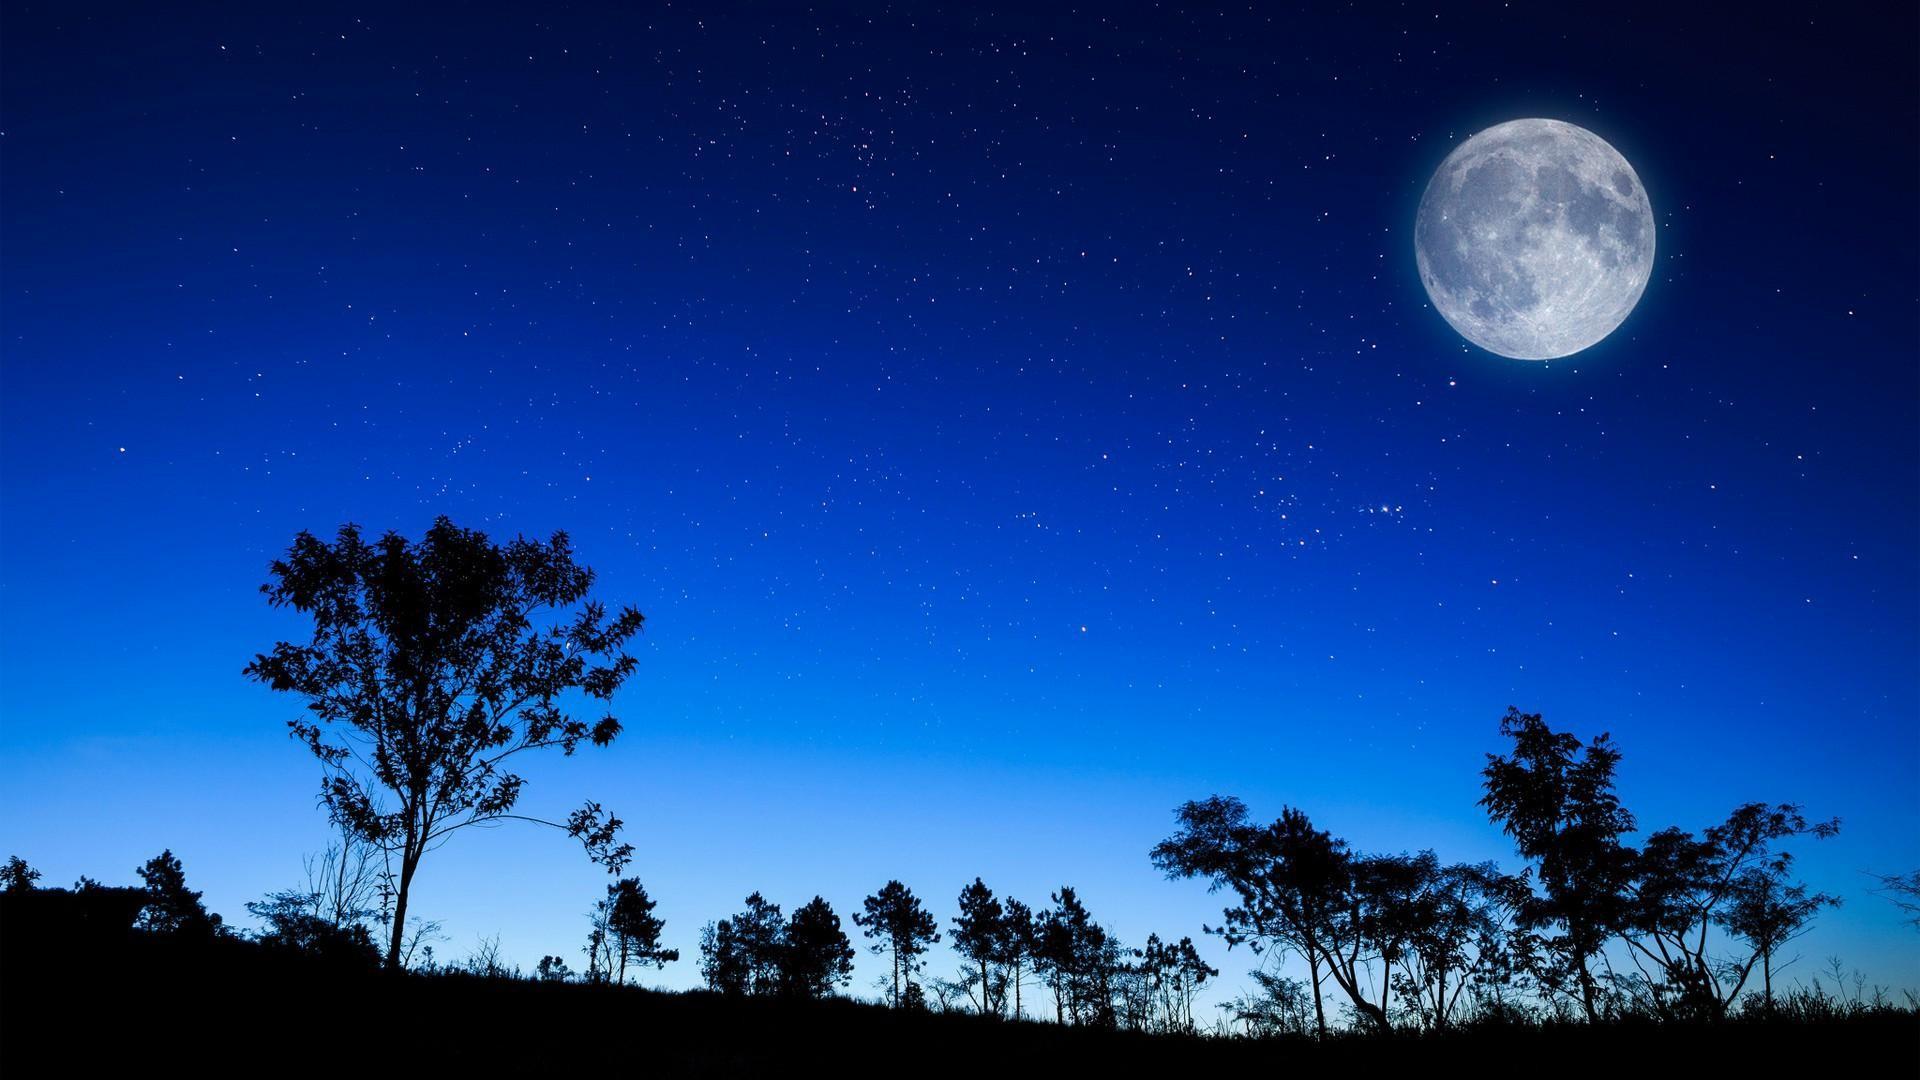 free-hd-beautiful-full-moon-starry-night-wallpapers-